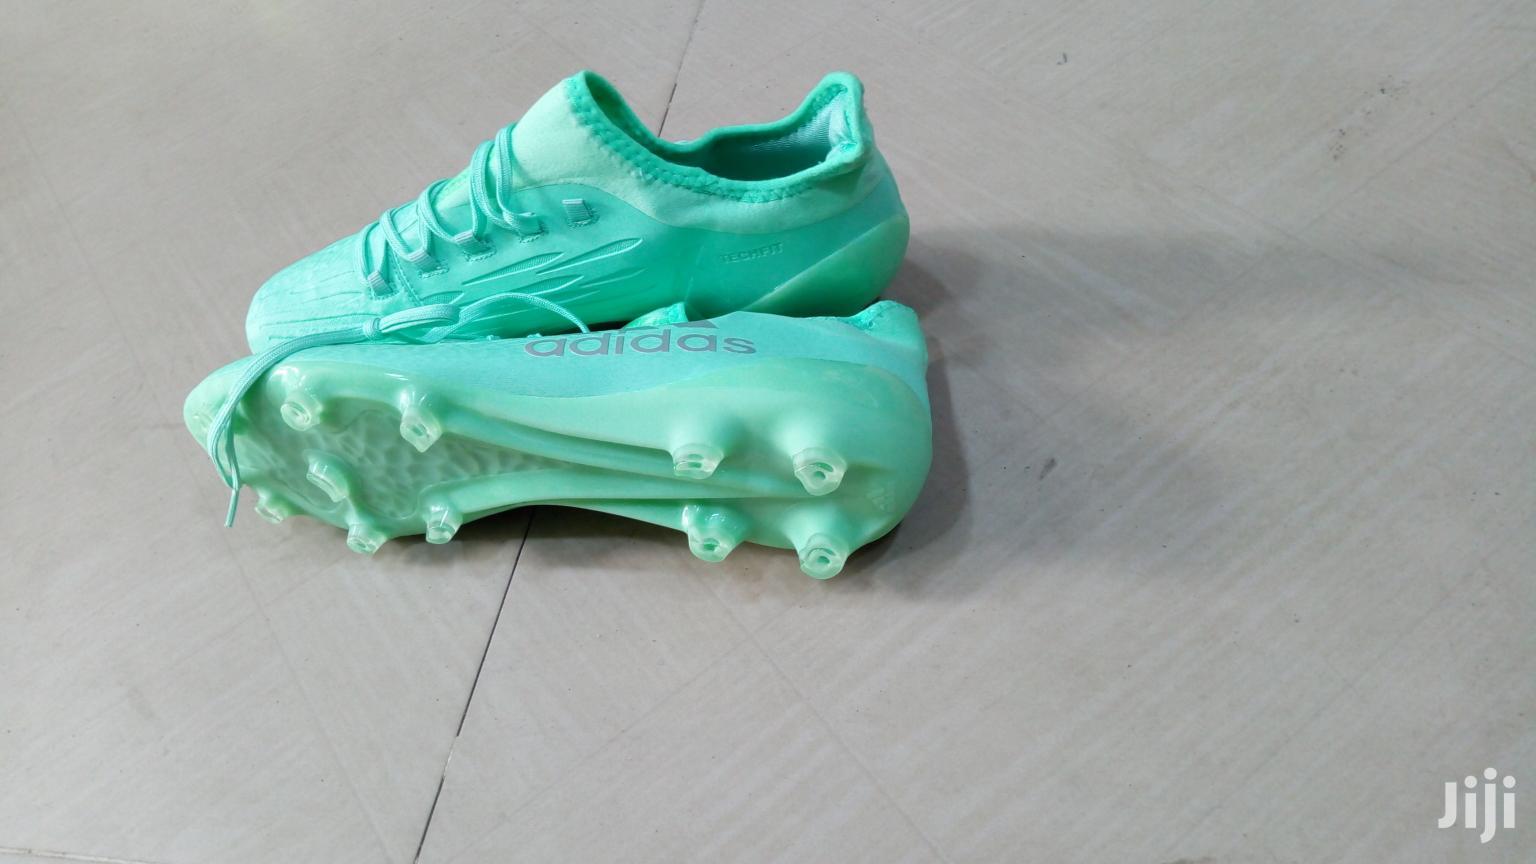 Latest Adidas Boot